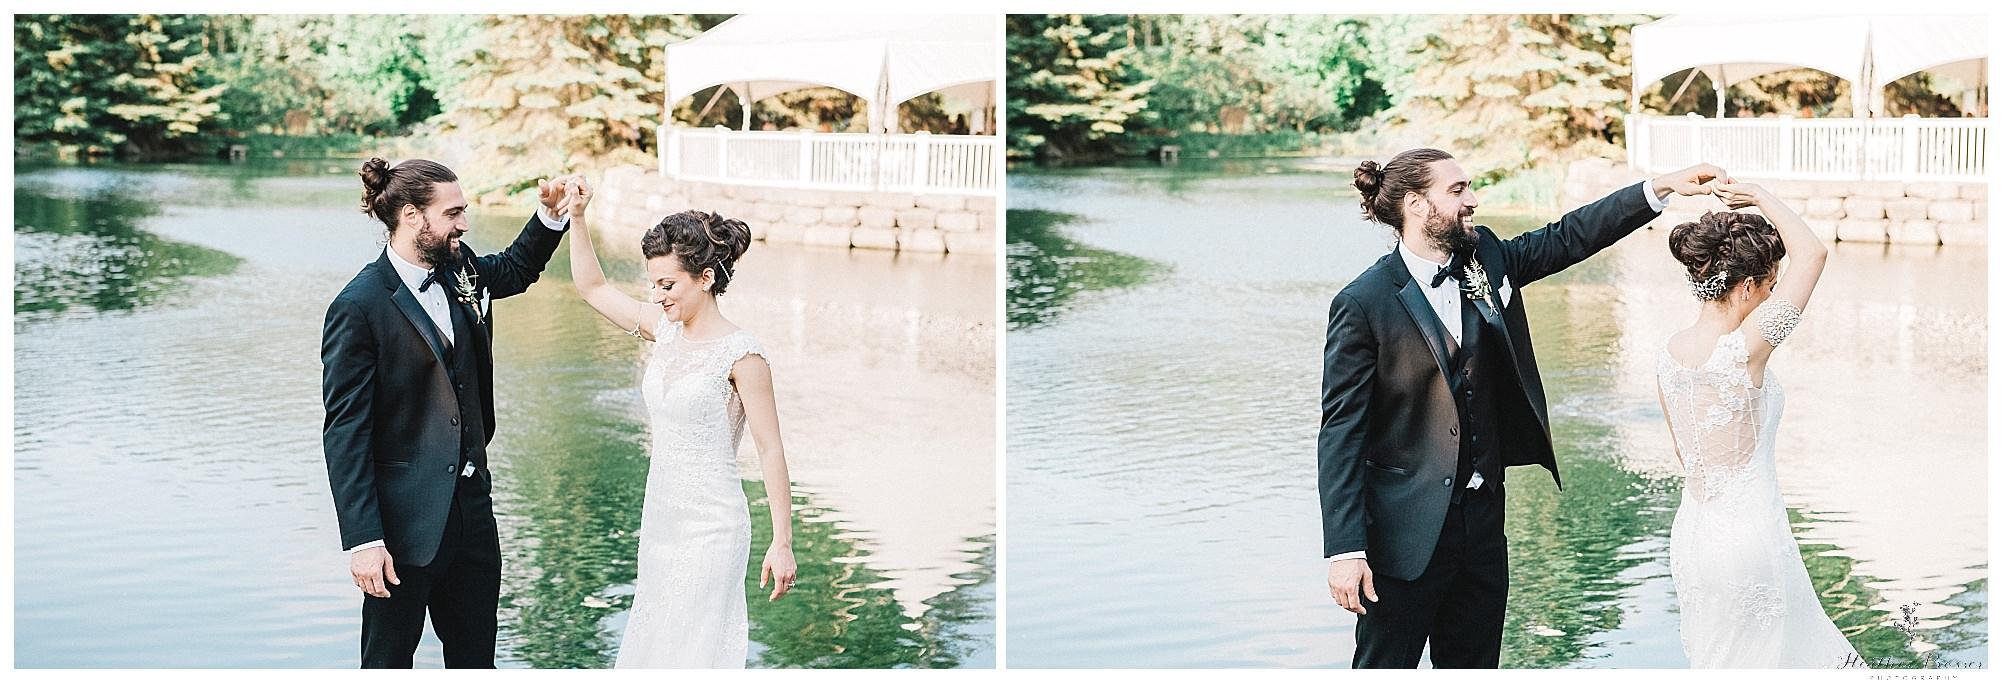 Destination Wedding_0335.jpg